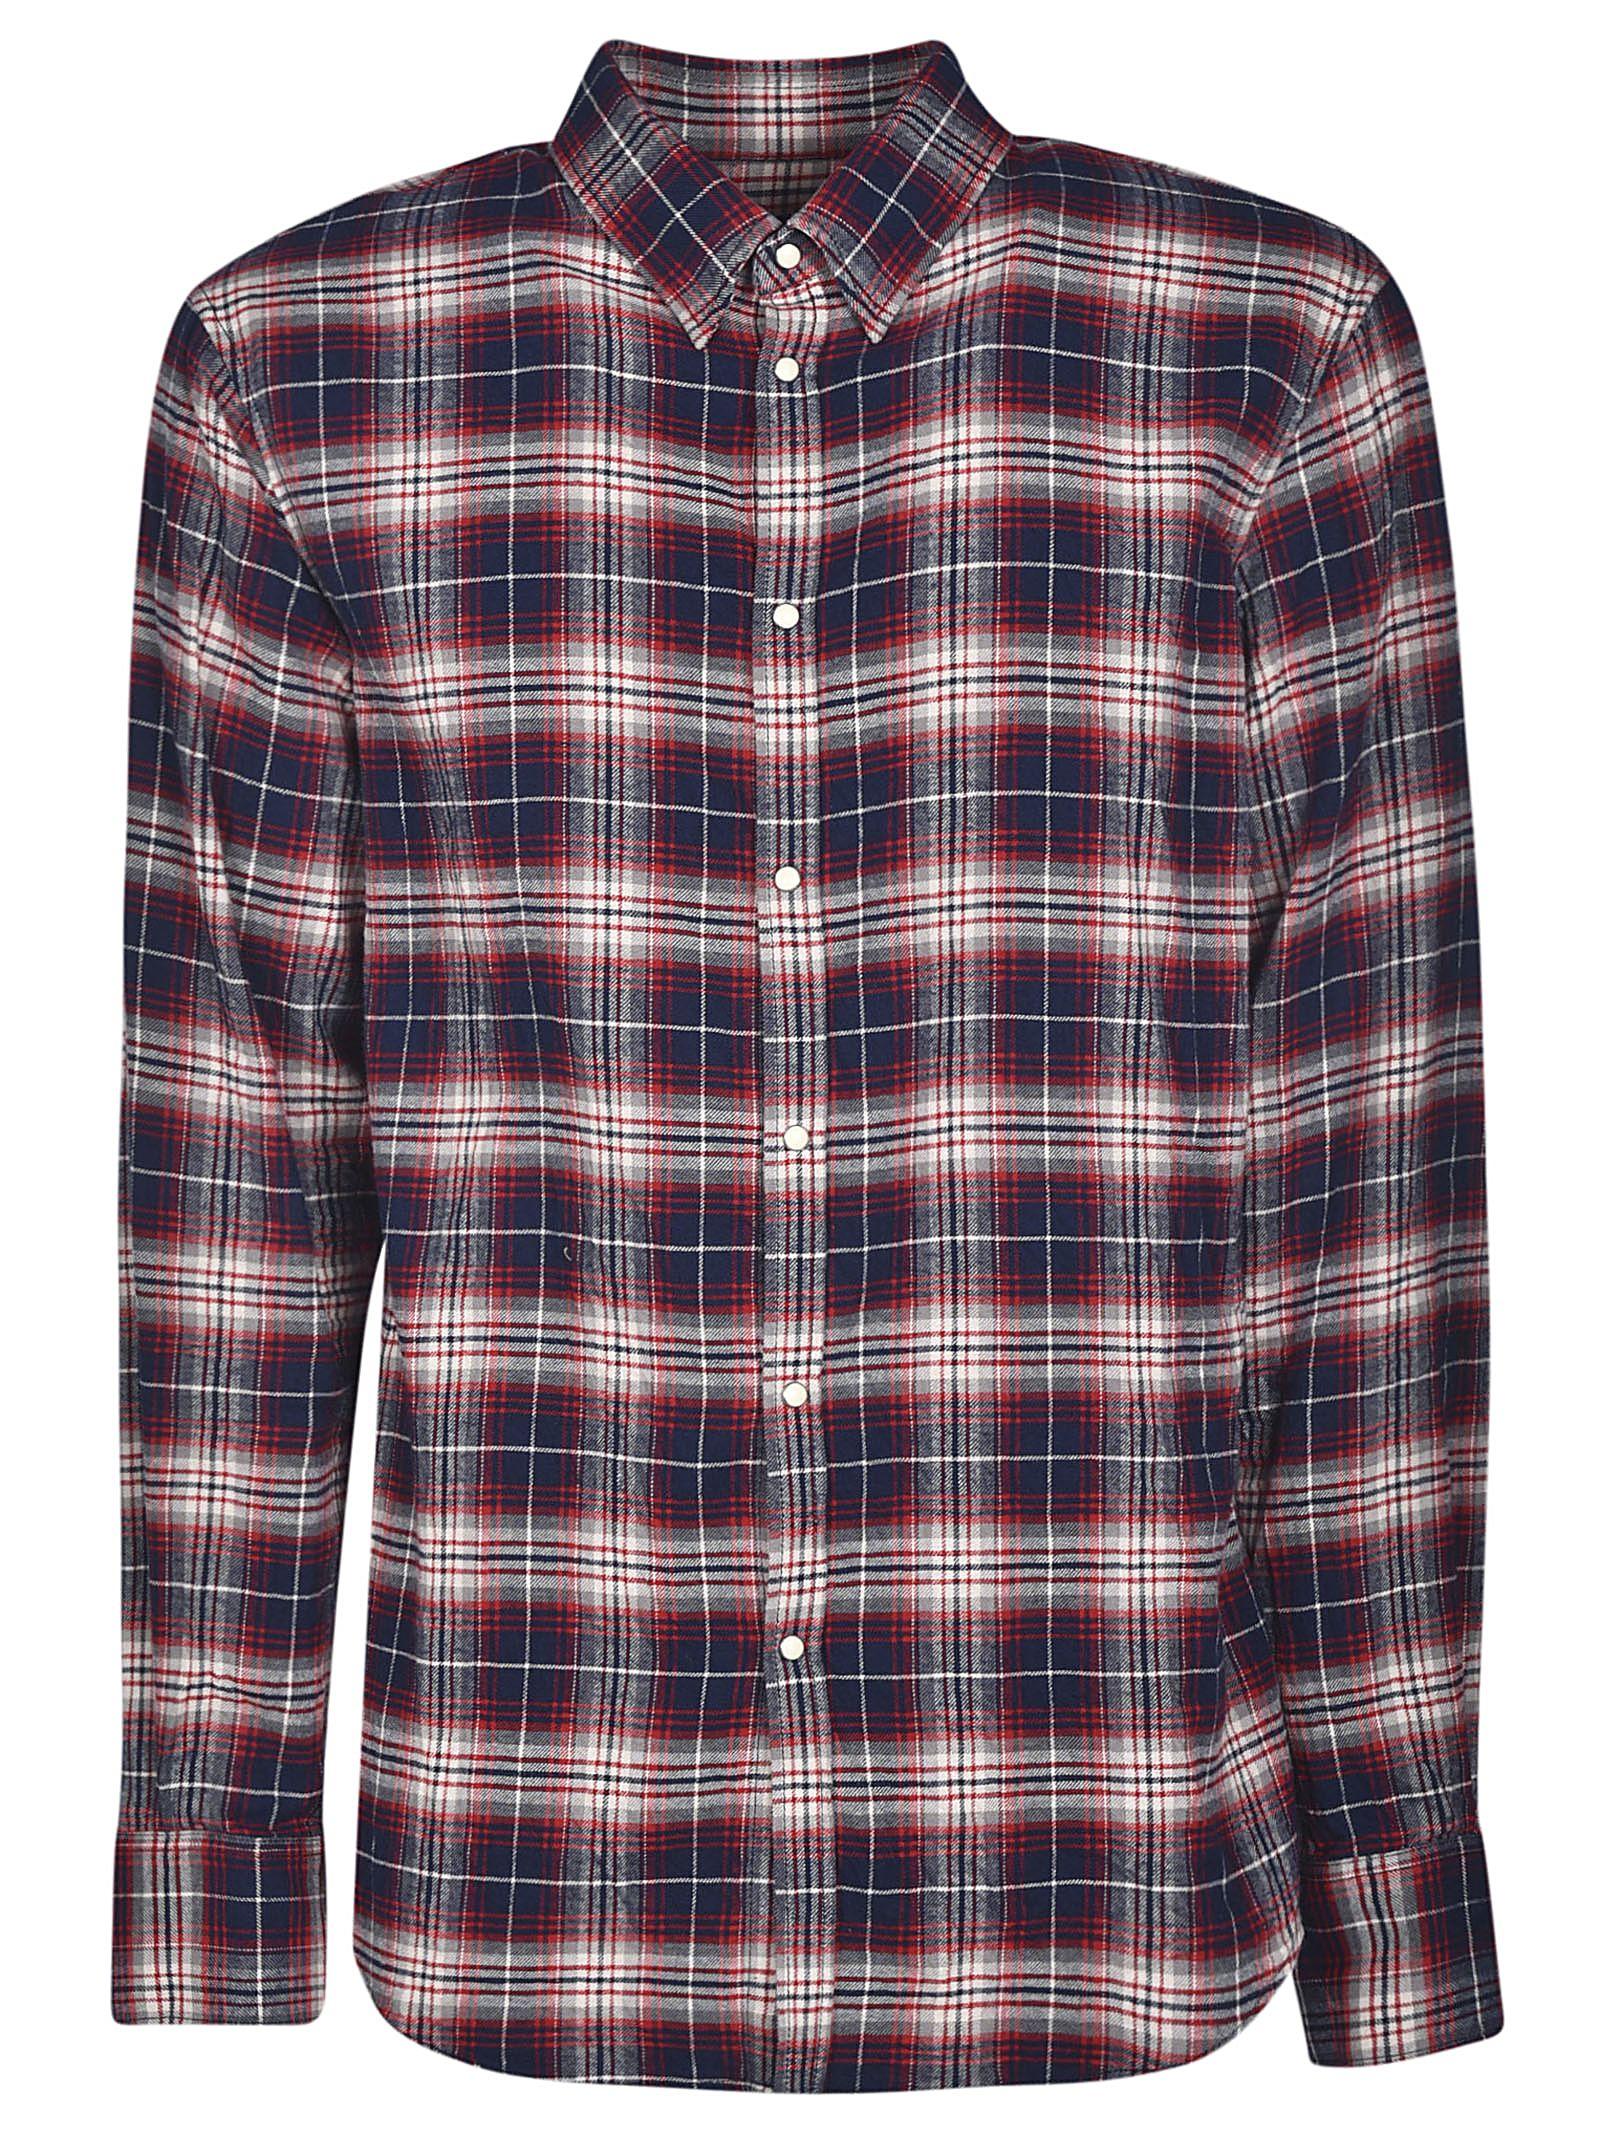 Dsquared2 Check Plaid Shirt